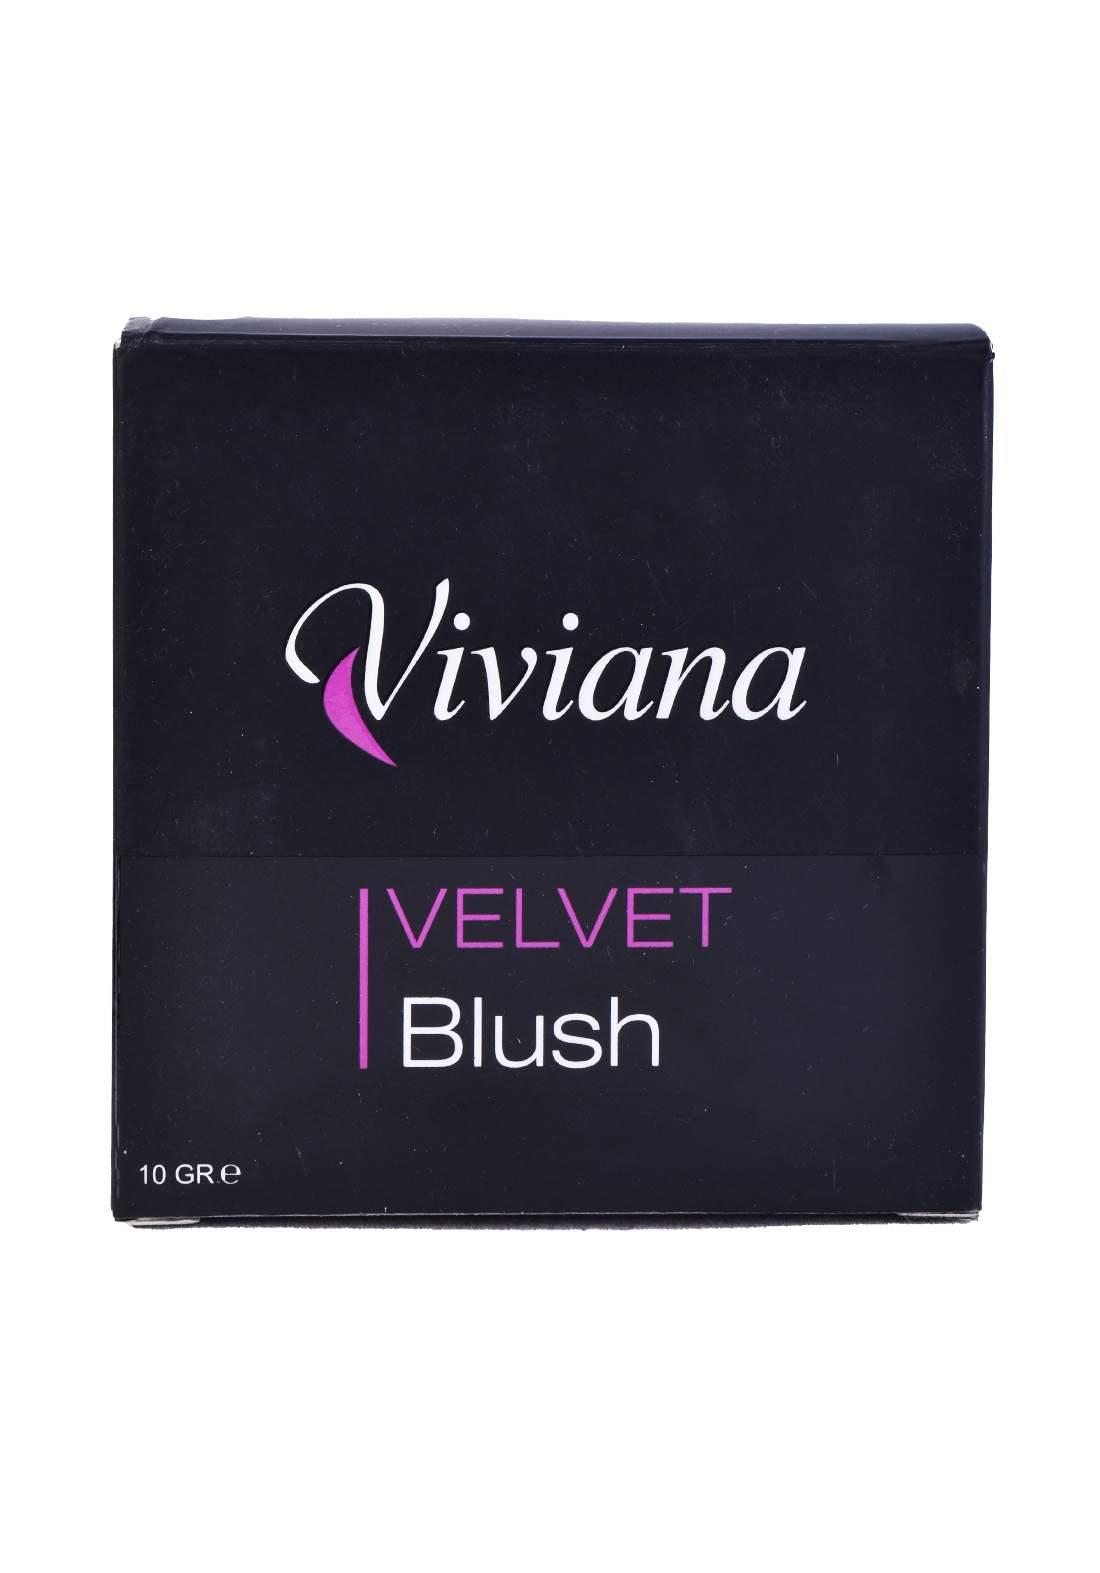 Viviana Velvet Blush No.03 10g احمر خدود